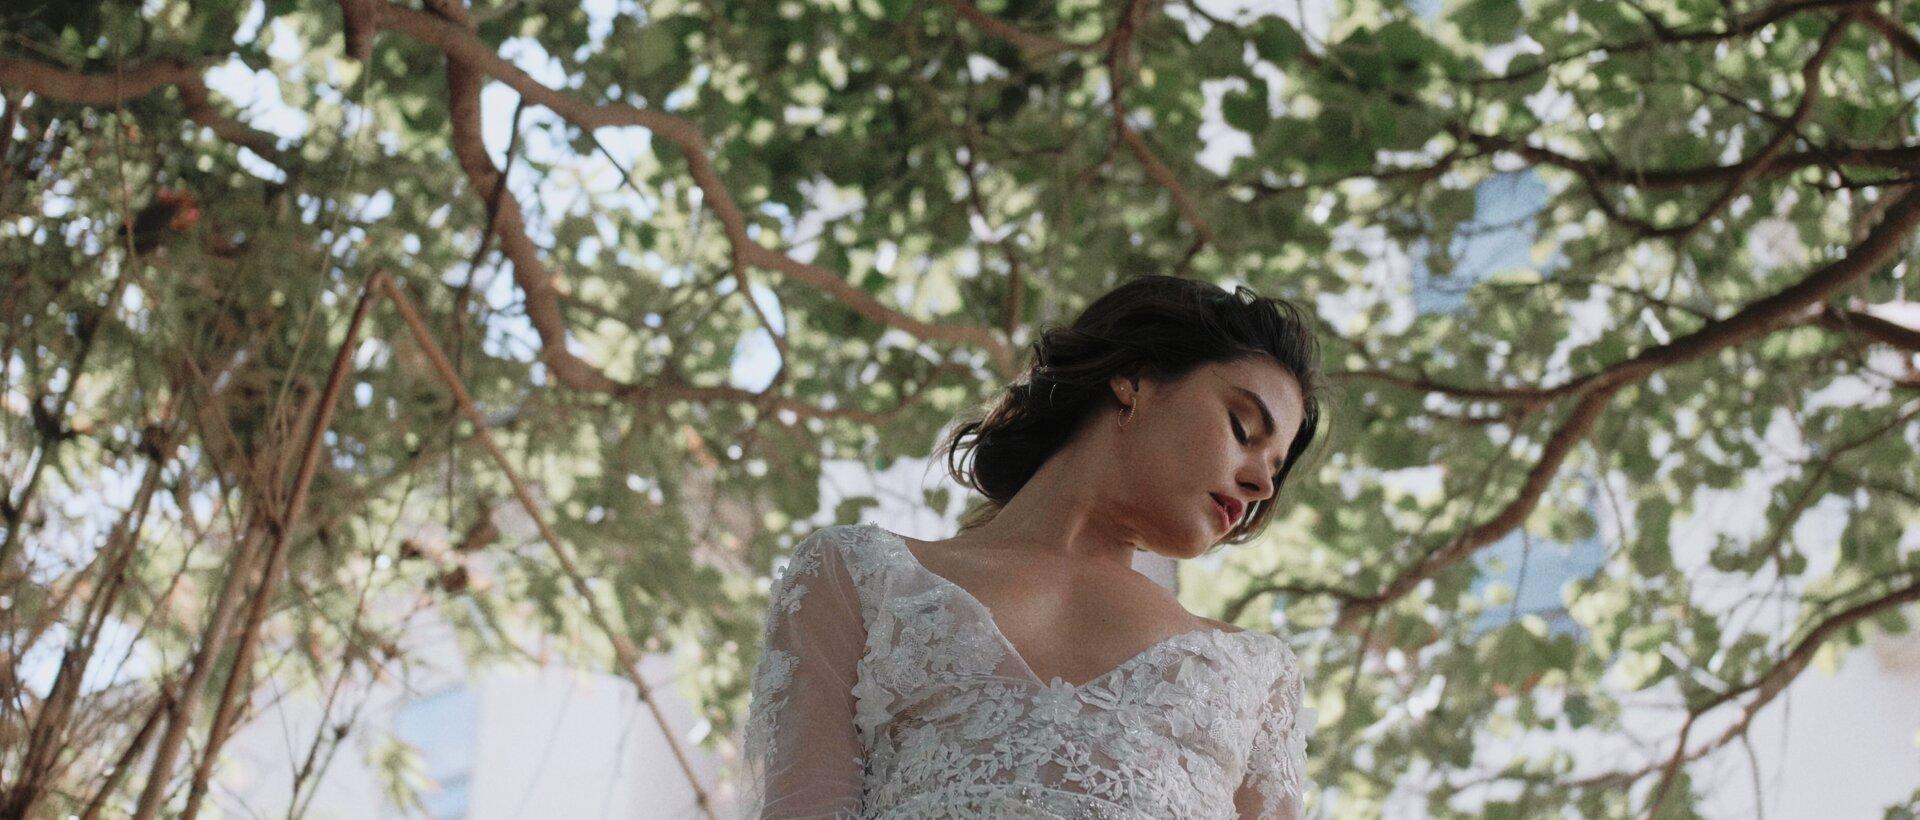 montage-kapalua-wedding-styled-shoot-_3.1.8.jpg